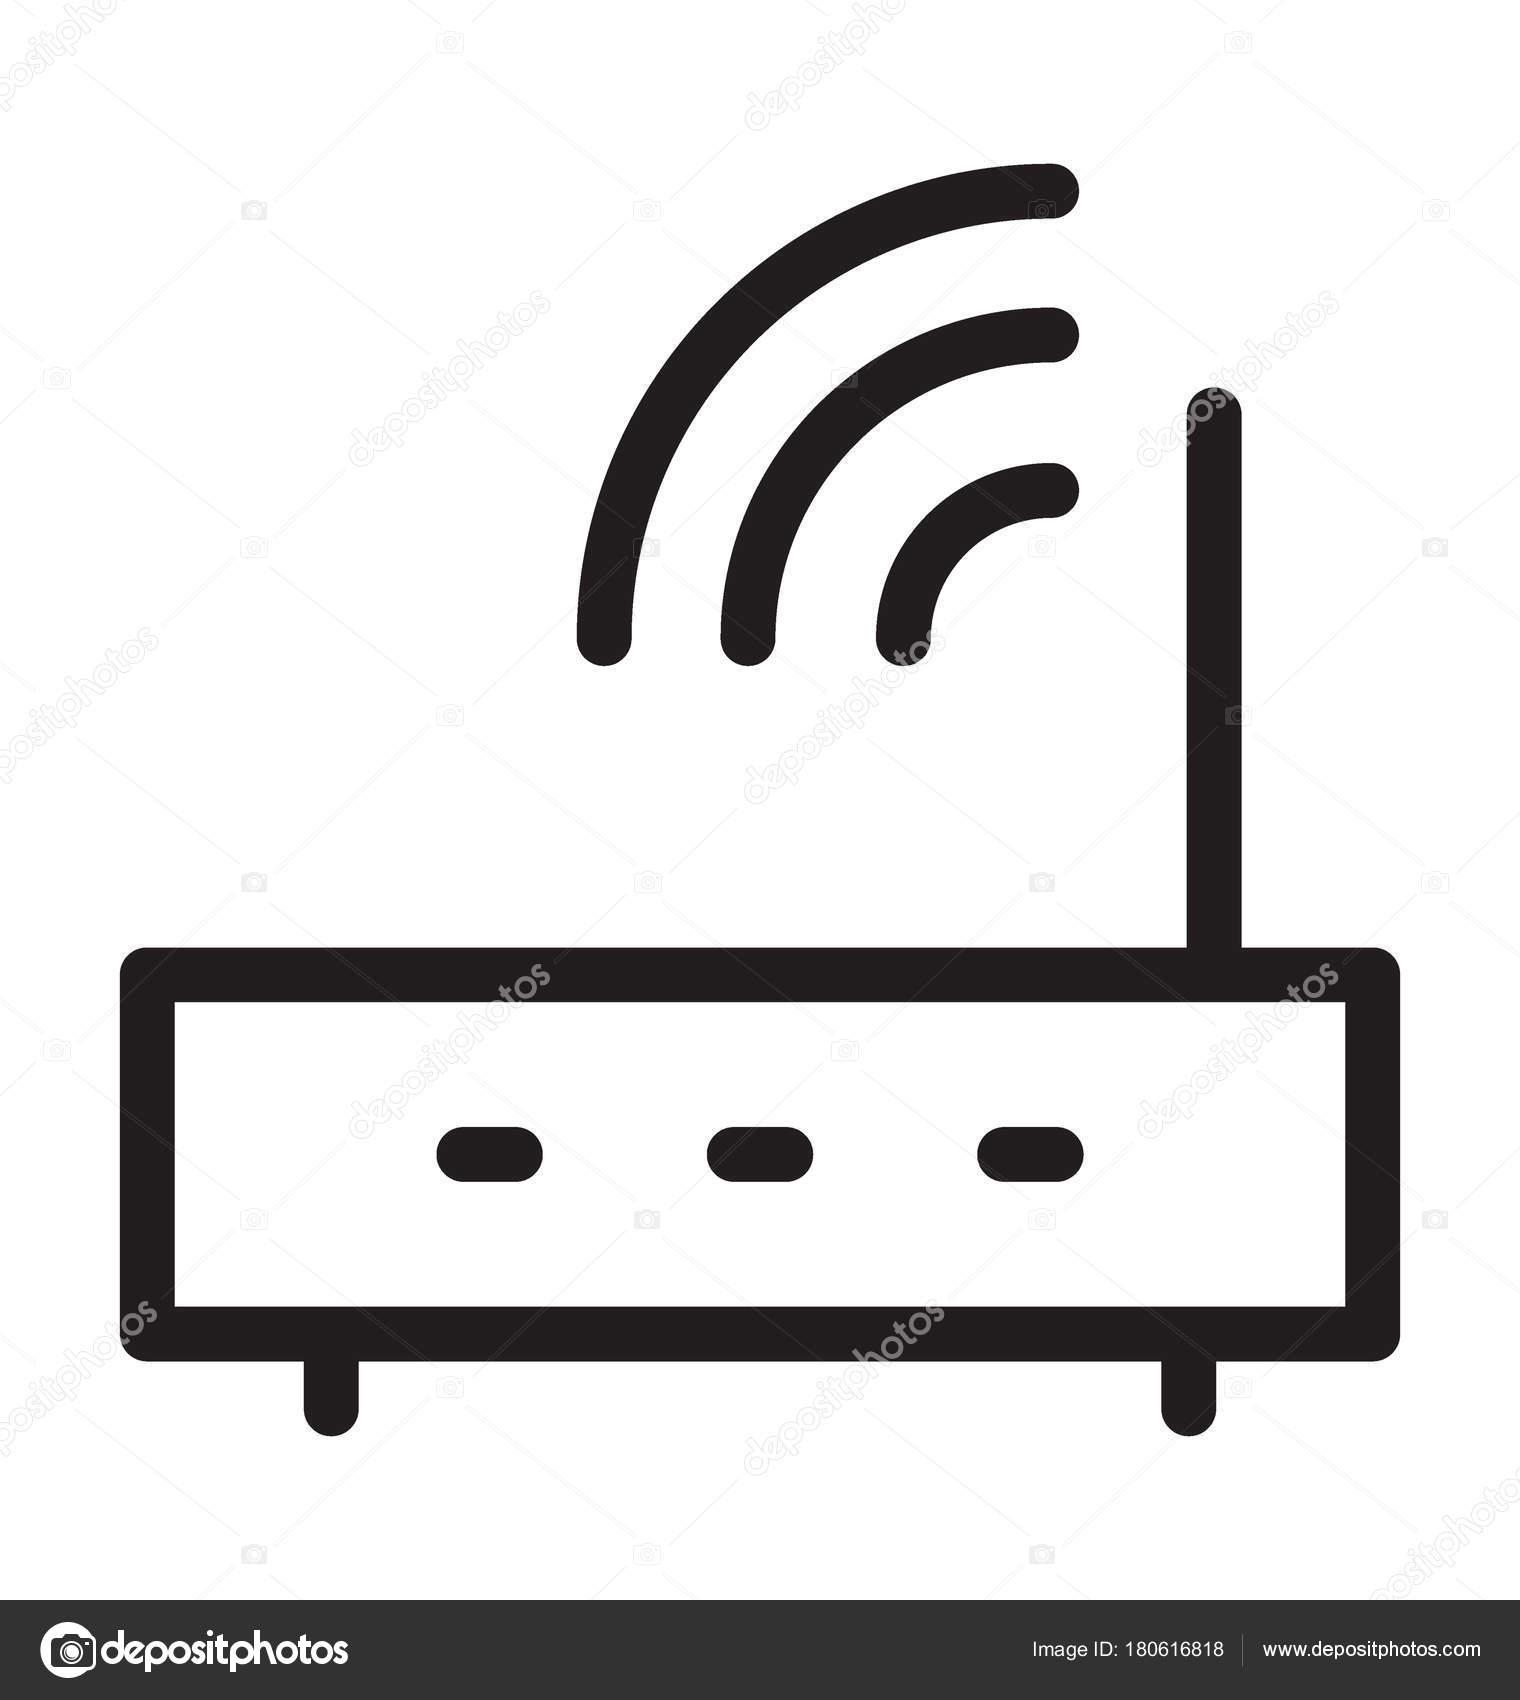 Wlan Router Linie Vektor Icon — Stockvektor © vectorsmarket #180616818